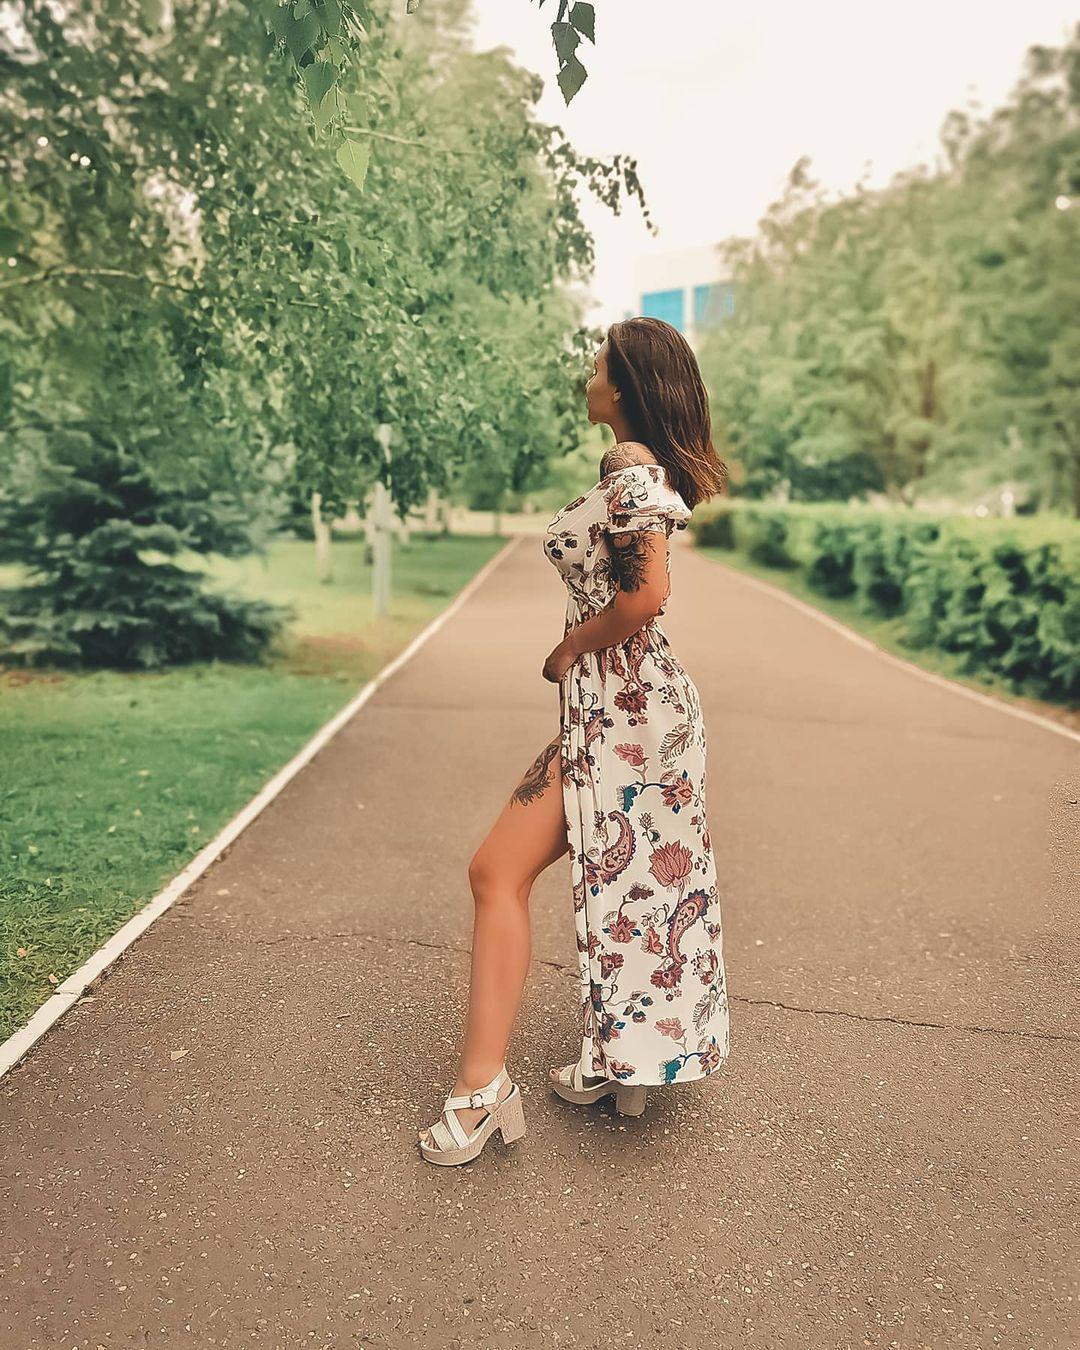 Anastasia-Nikolskaya-Wallpapers-Insta-Fit-Bio-2